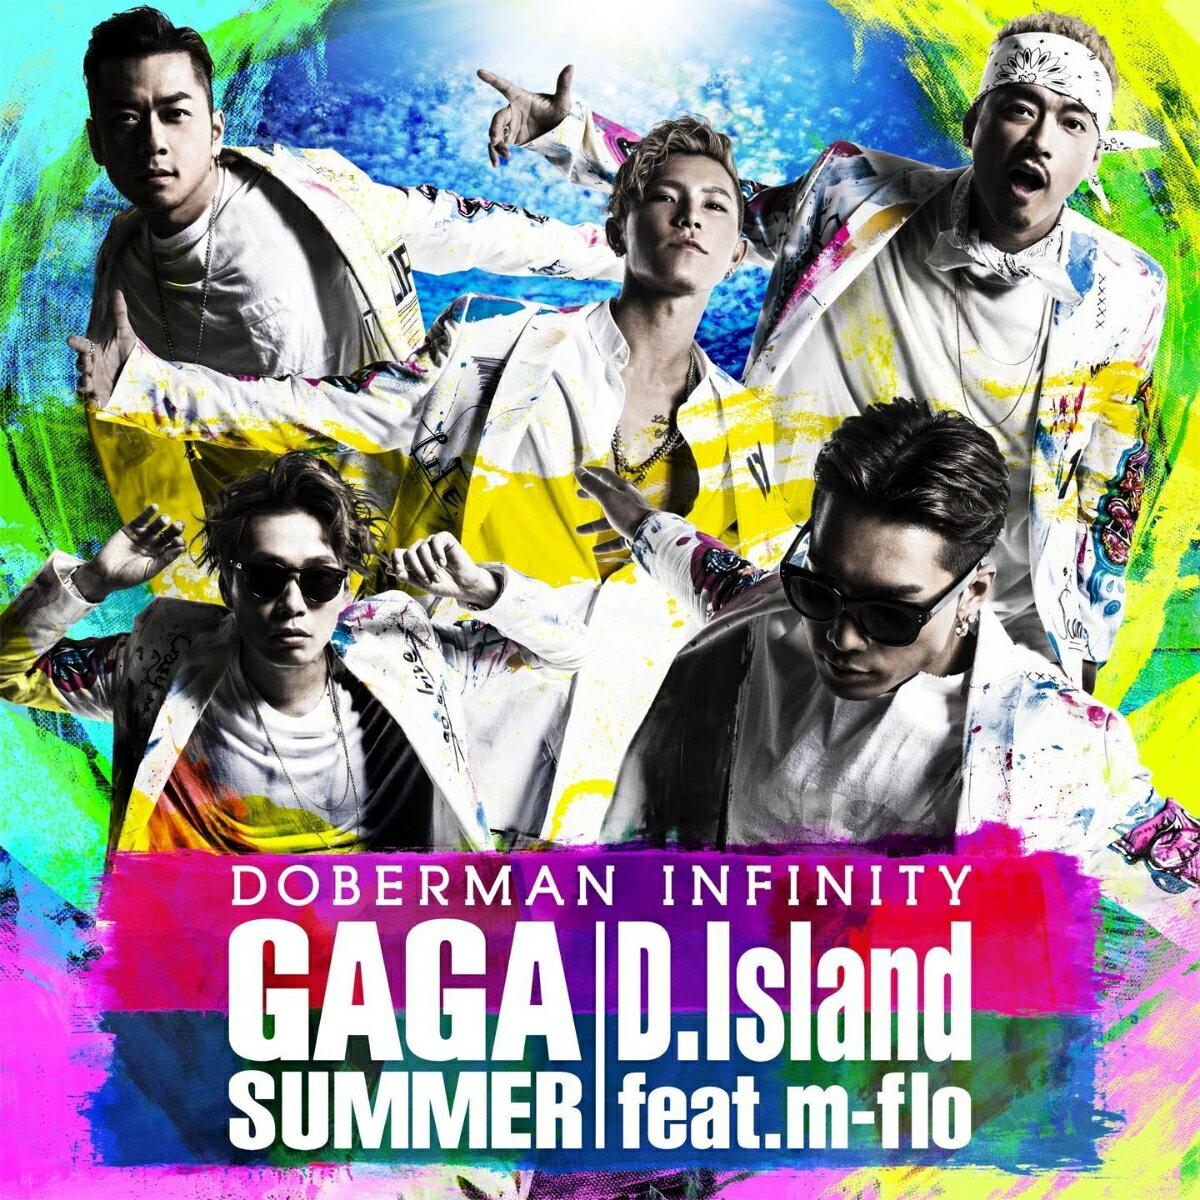 GA GA SUMMER/D.Island feat. m-flo [ DOBERMAN INFINITY ]